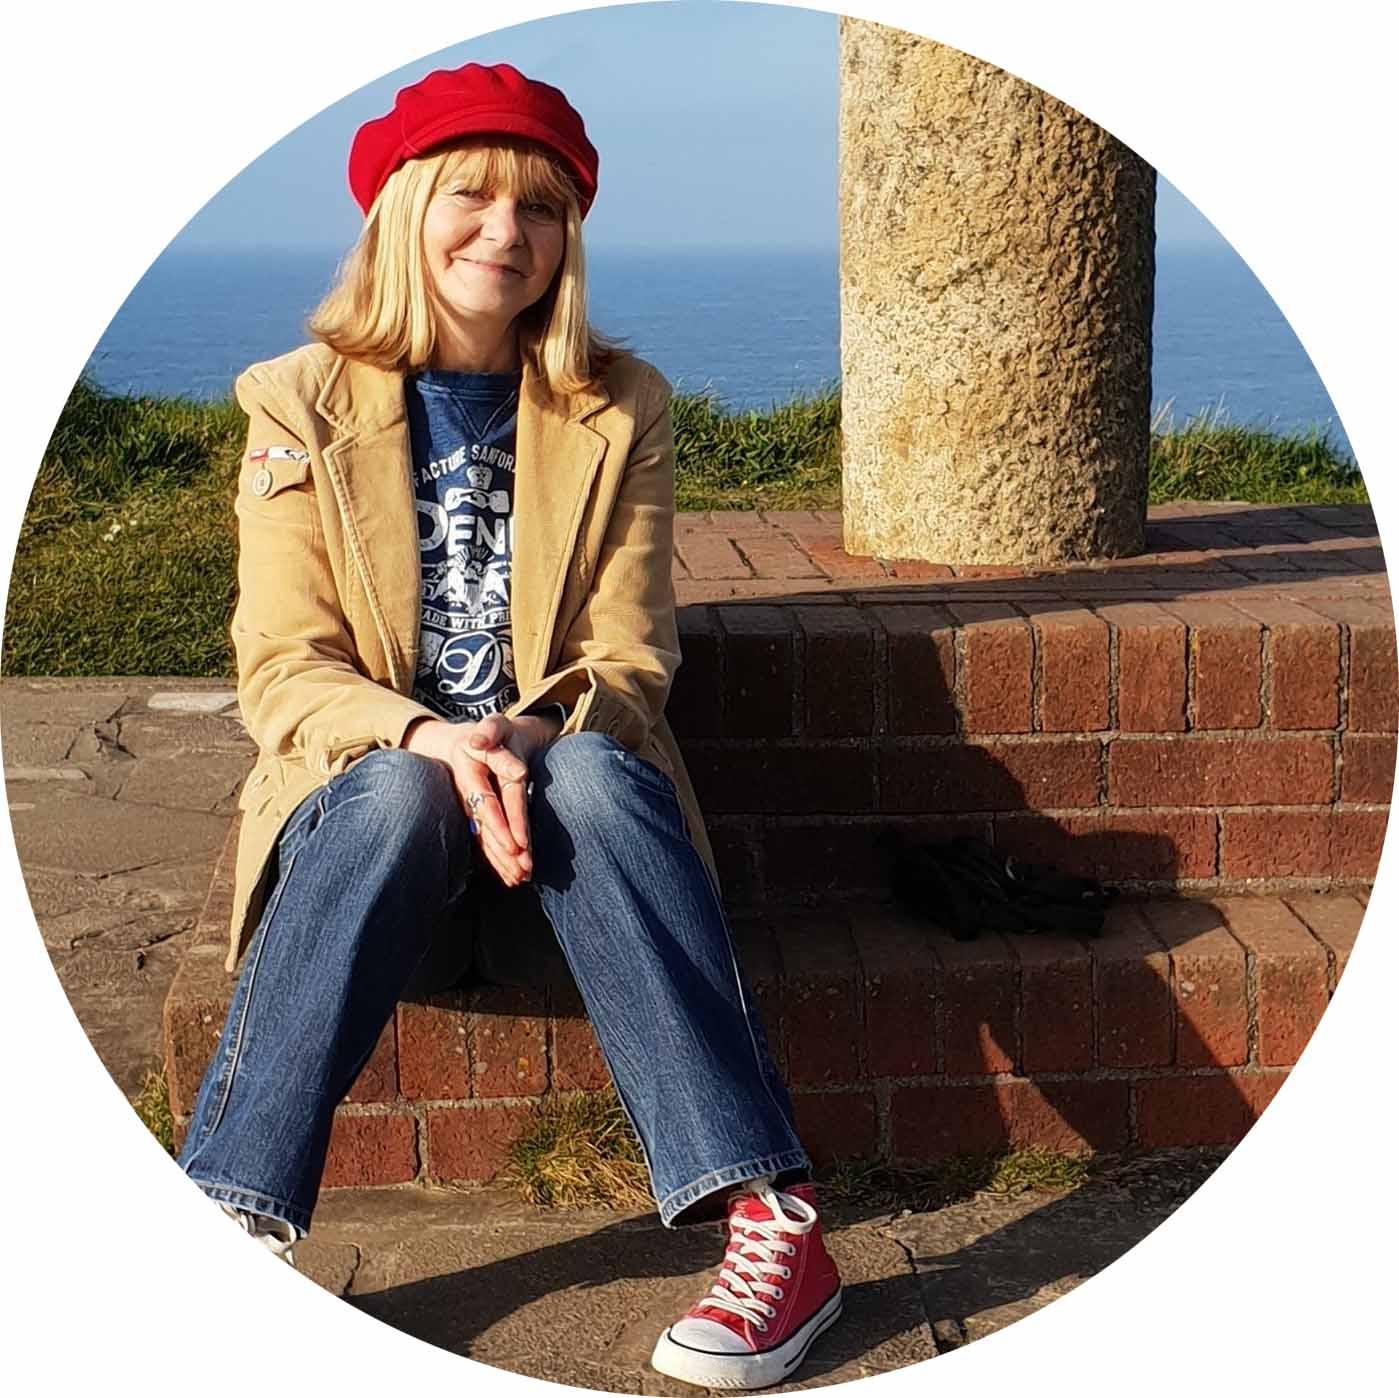 Chloe Skinner, Brighton